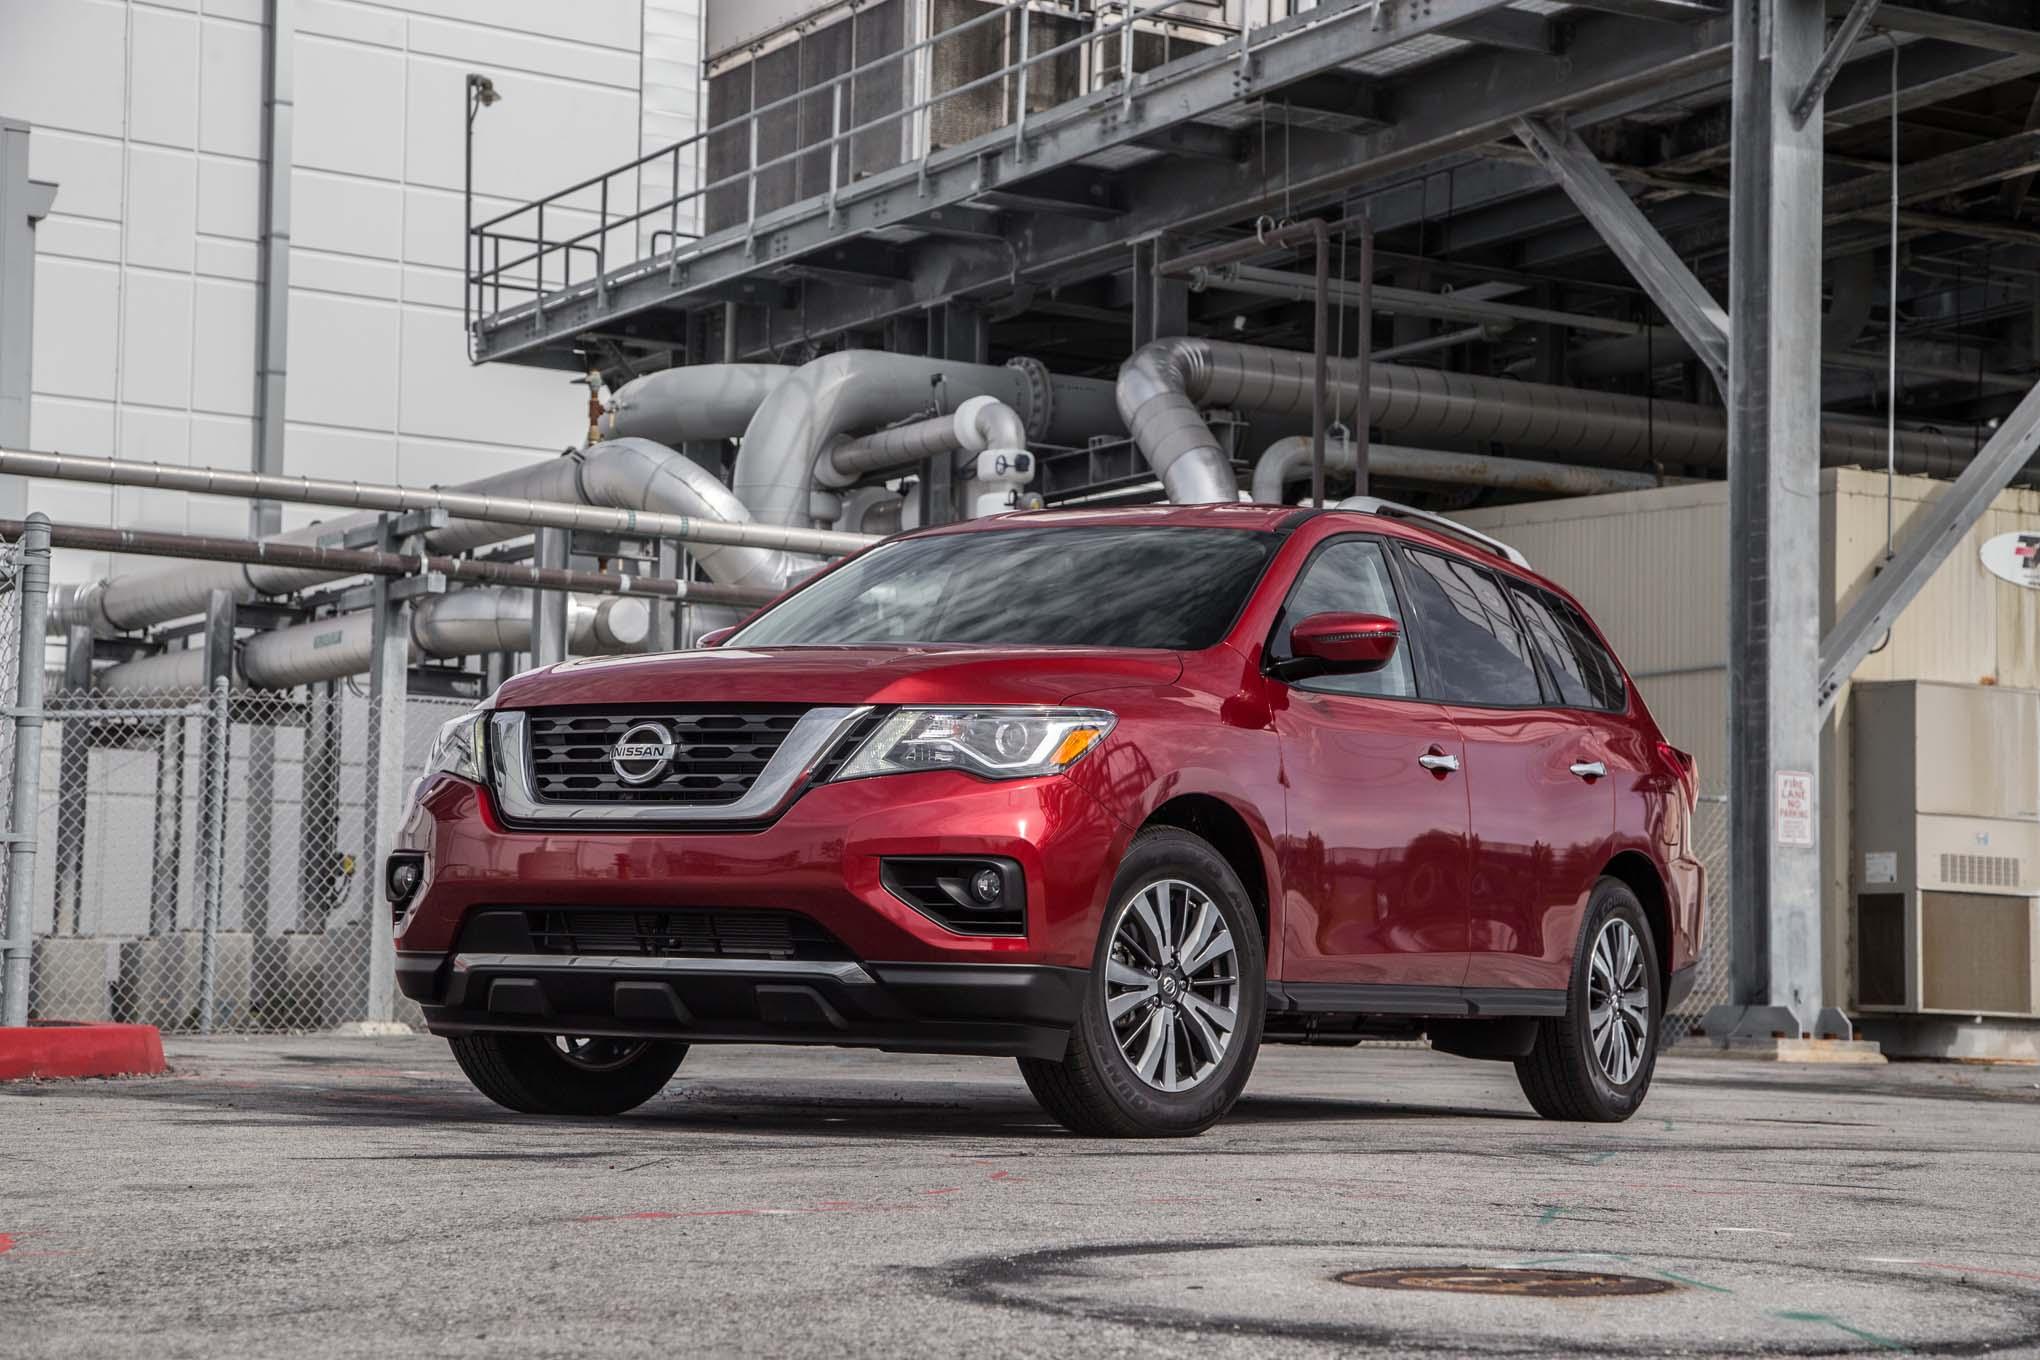 2017 Nissan Pathfinder SV 4WD front three quarter